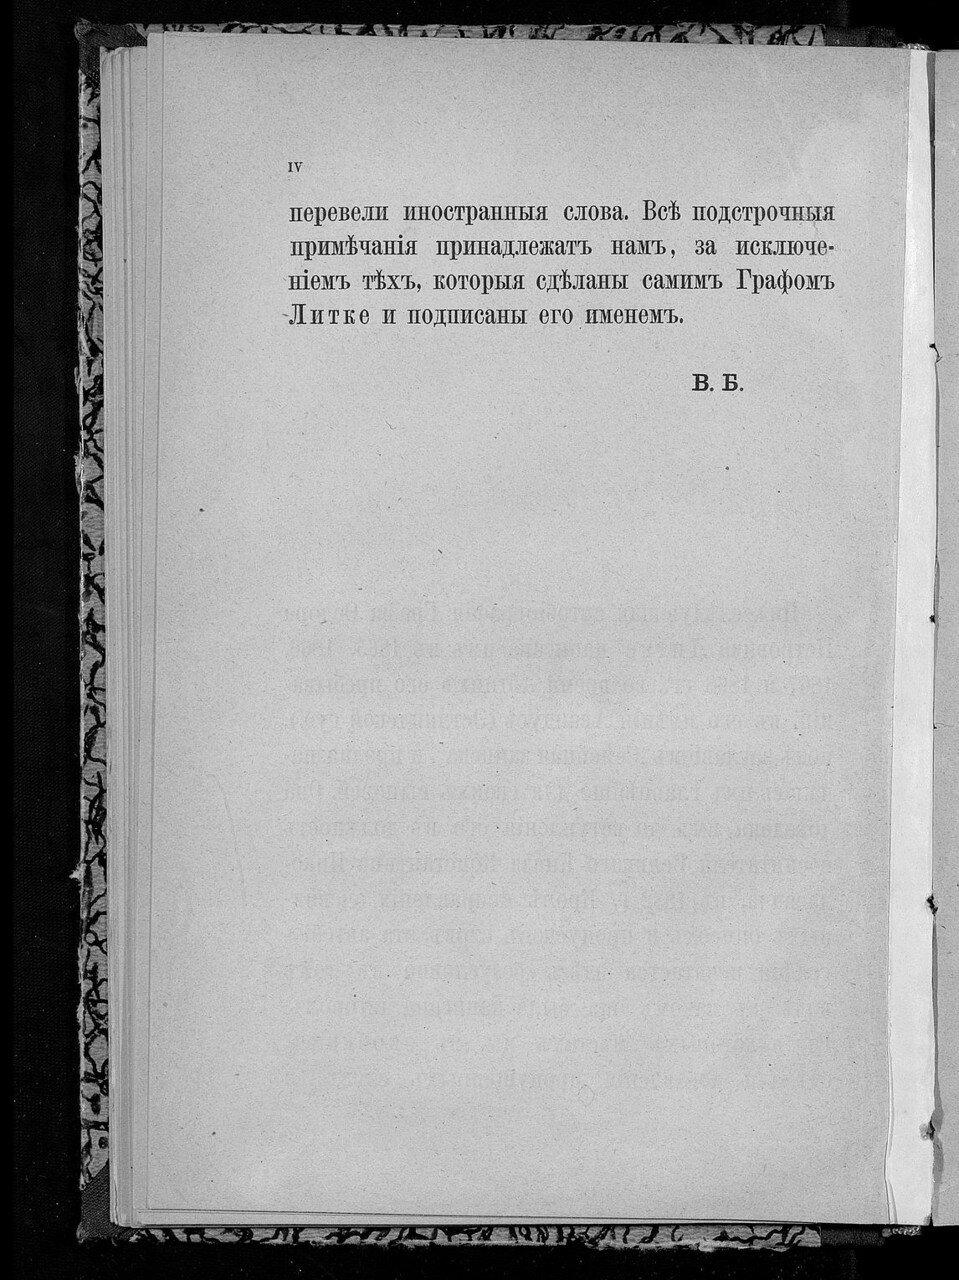 https://img-fotki.yandex.ru/get/27836/199368979.d3/0_21dd96_b1aec7ac_XXXL.jpg